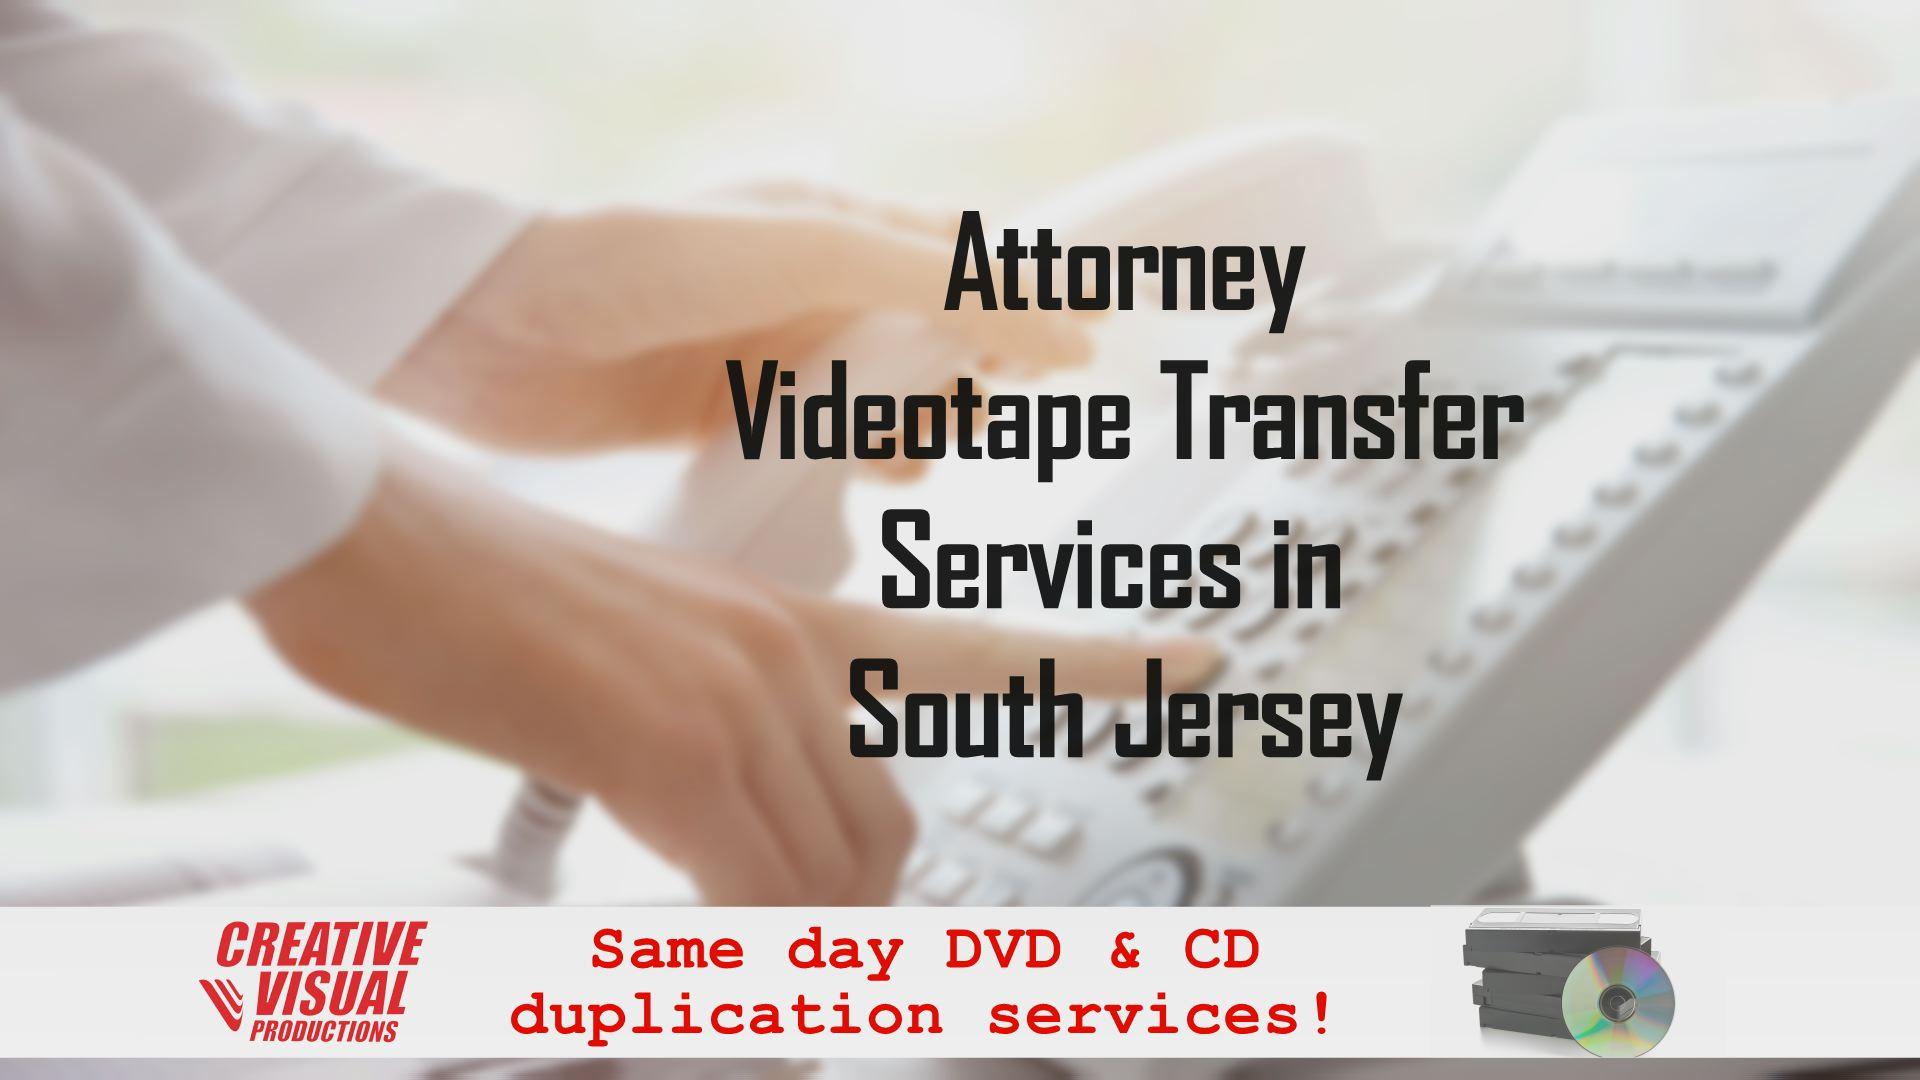 Attorney Videotape Transfer Services